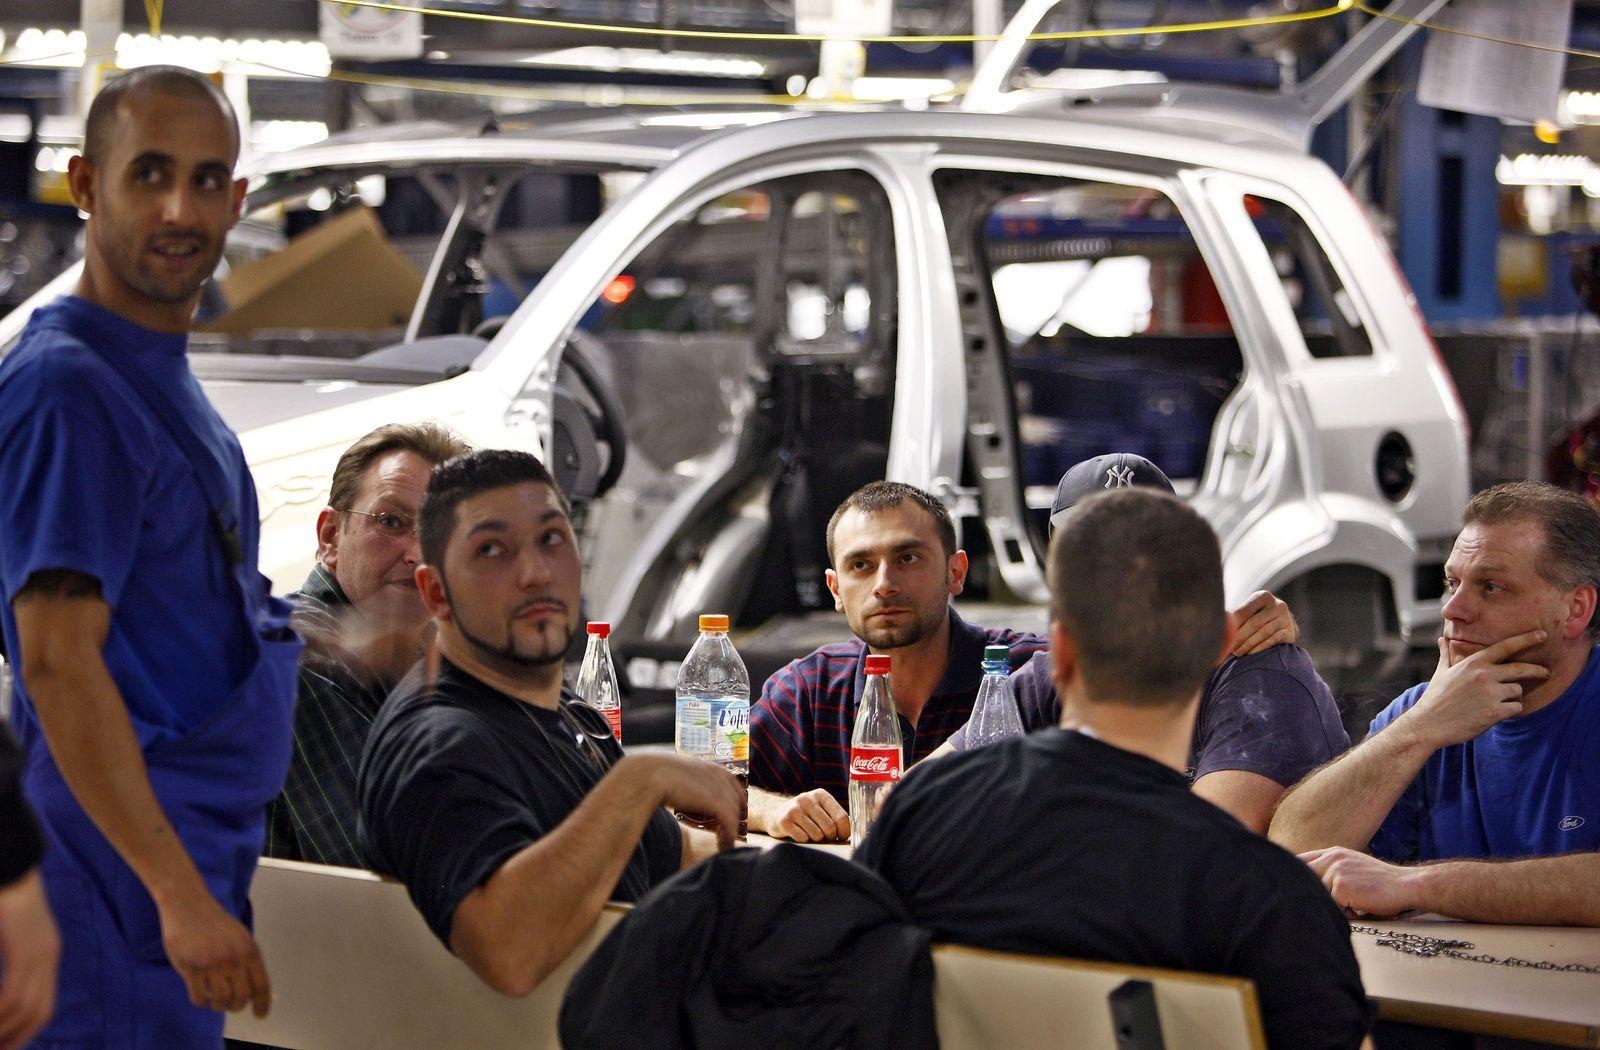 Mittagspause / Arbeitspause / Produktion / Ford in Köln